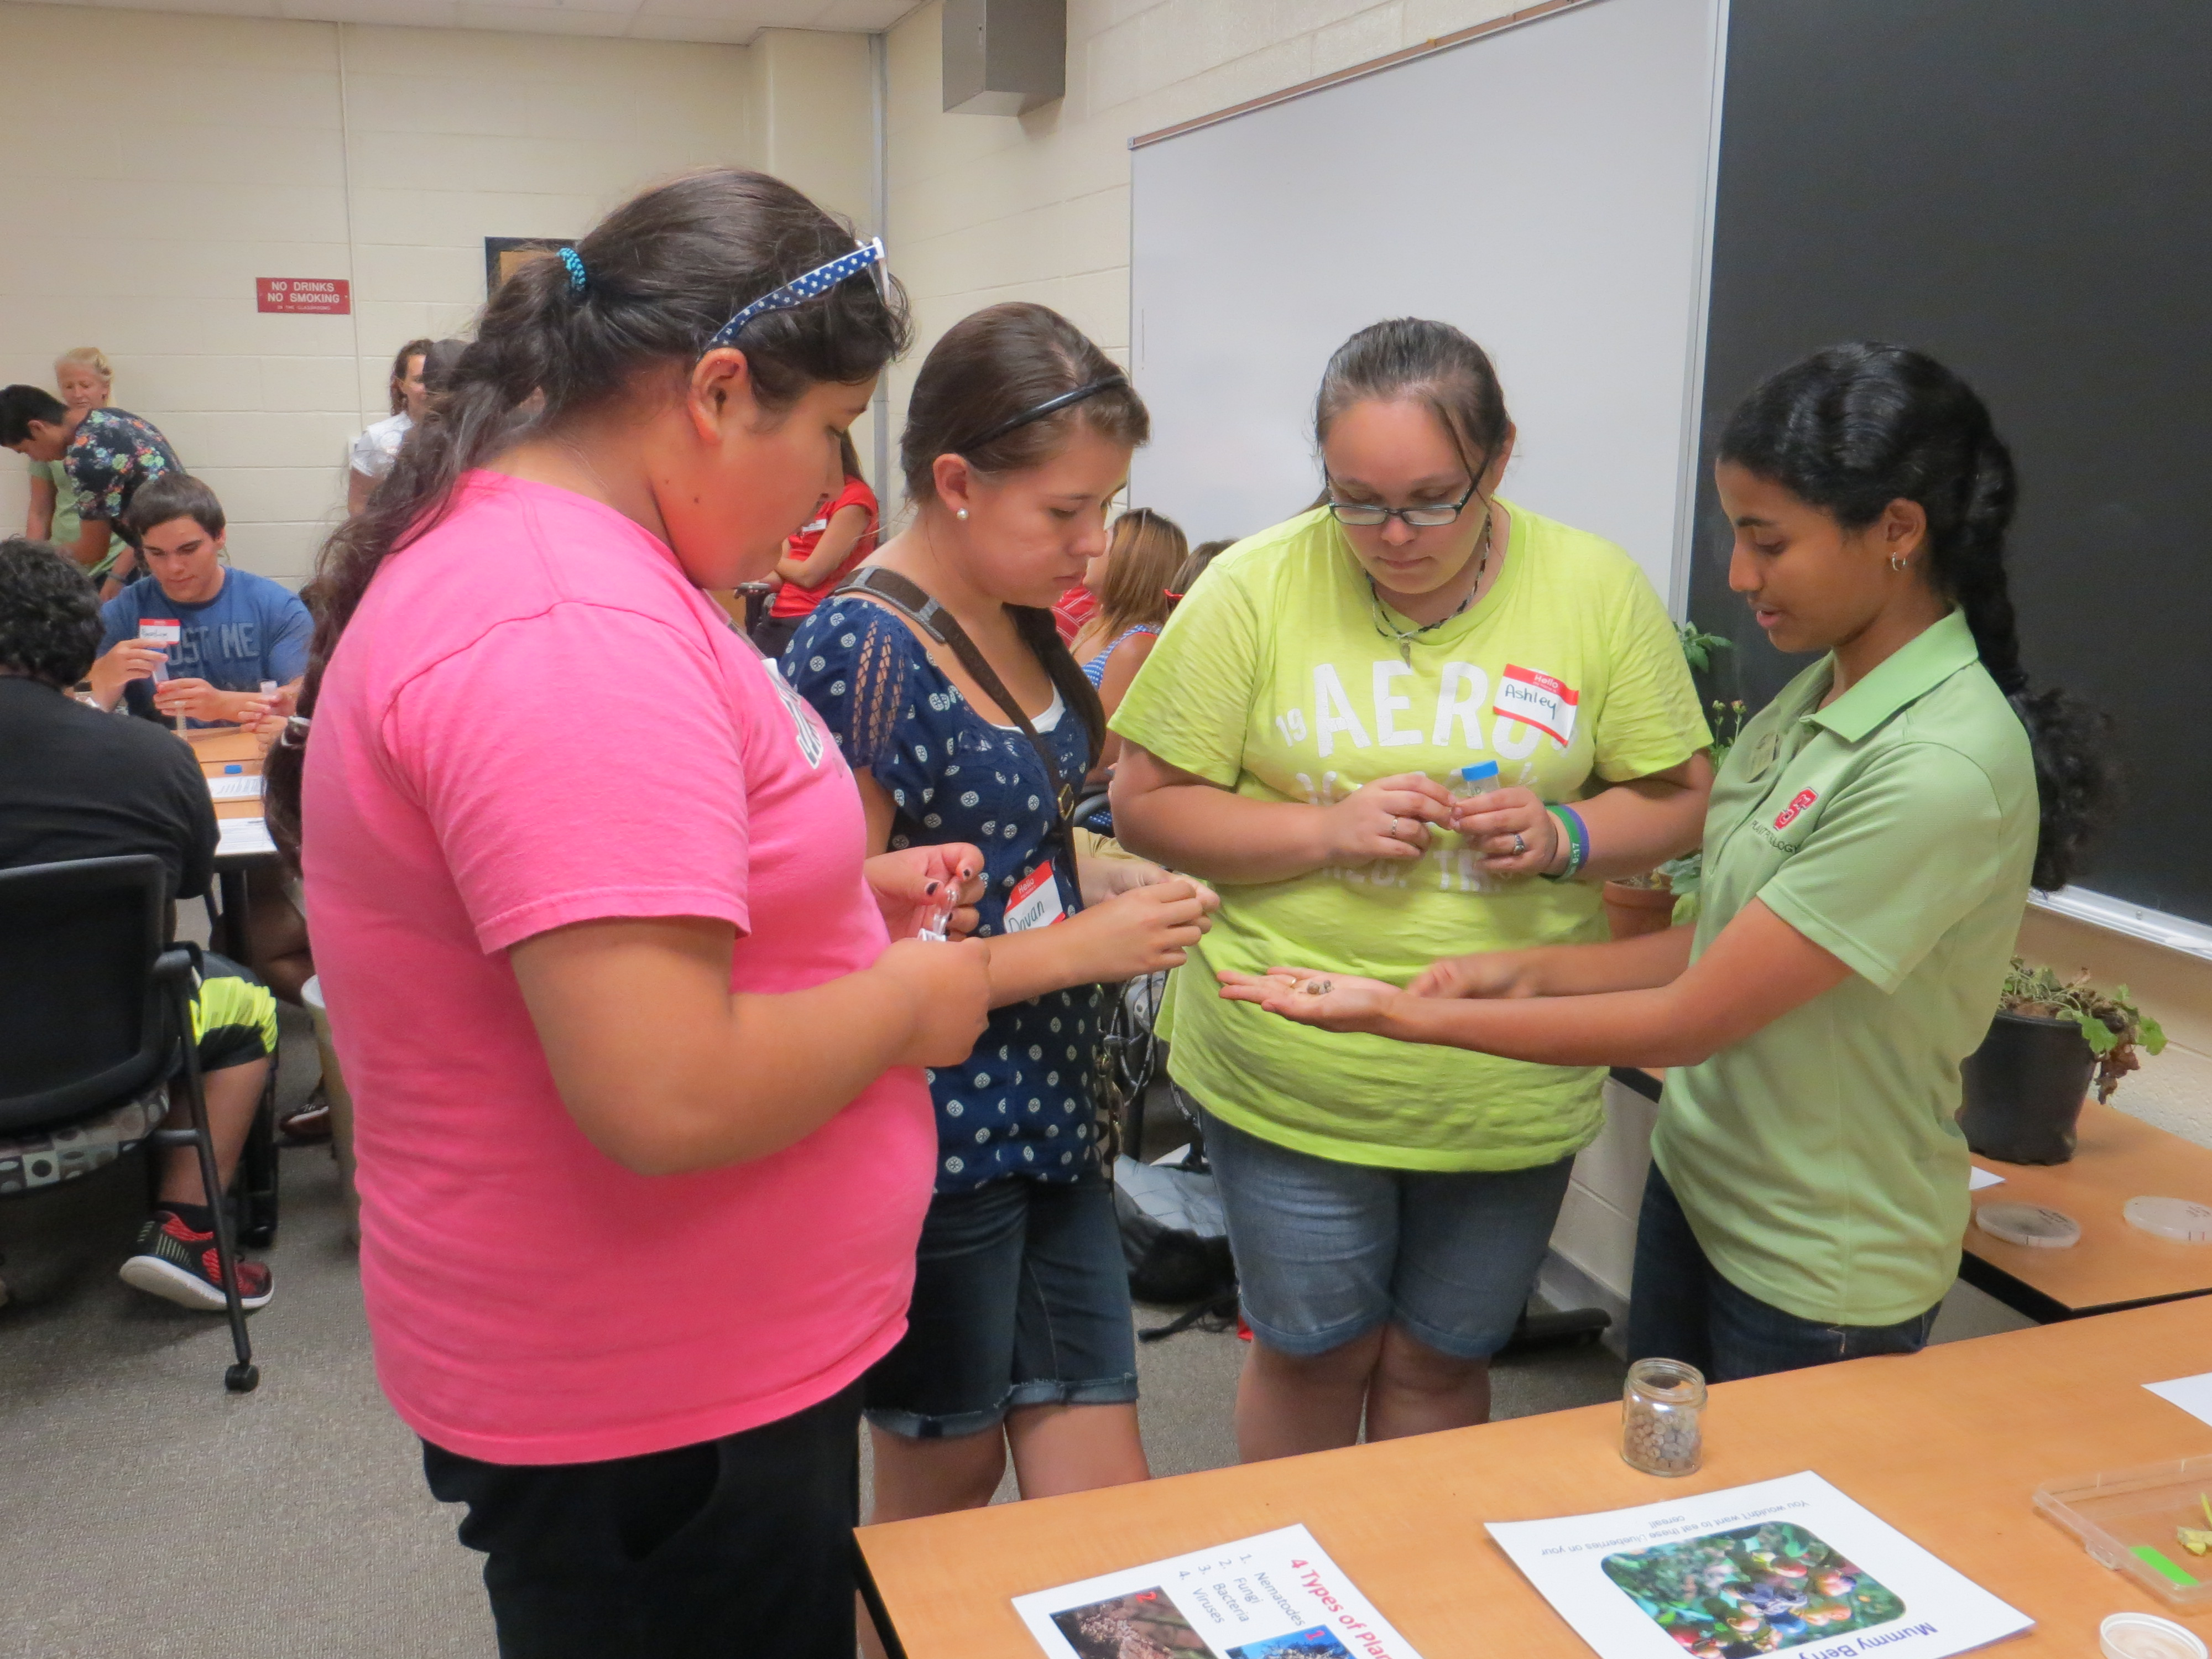 Graduate Student Anna Thomas shows high school students mummy berry disease samples. Photo Credit: Alyssa Koehler.